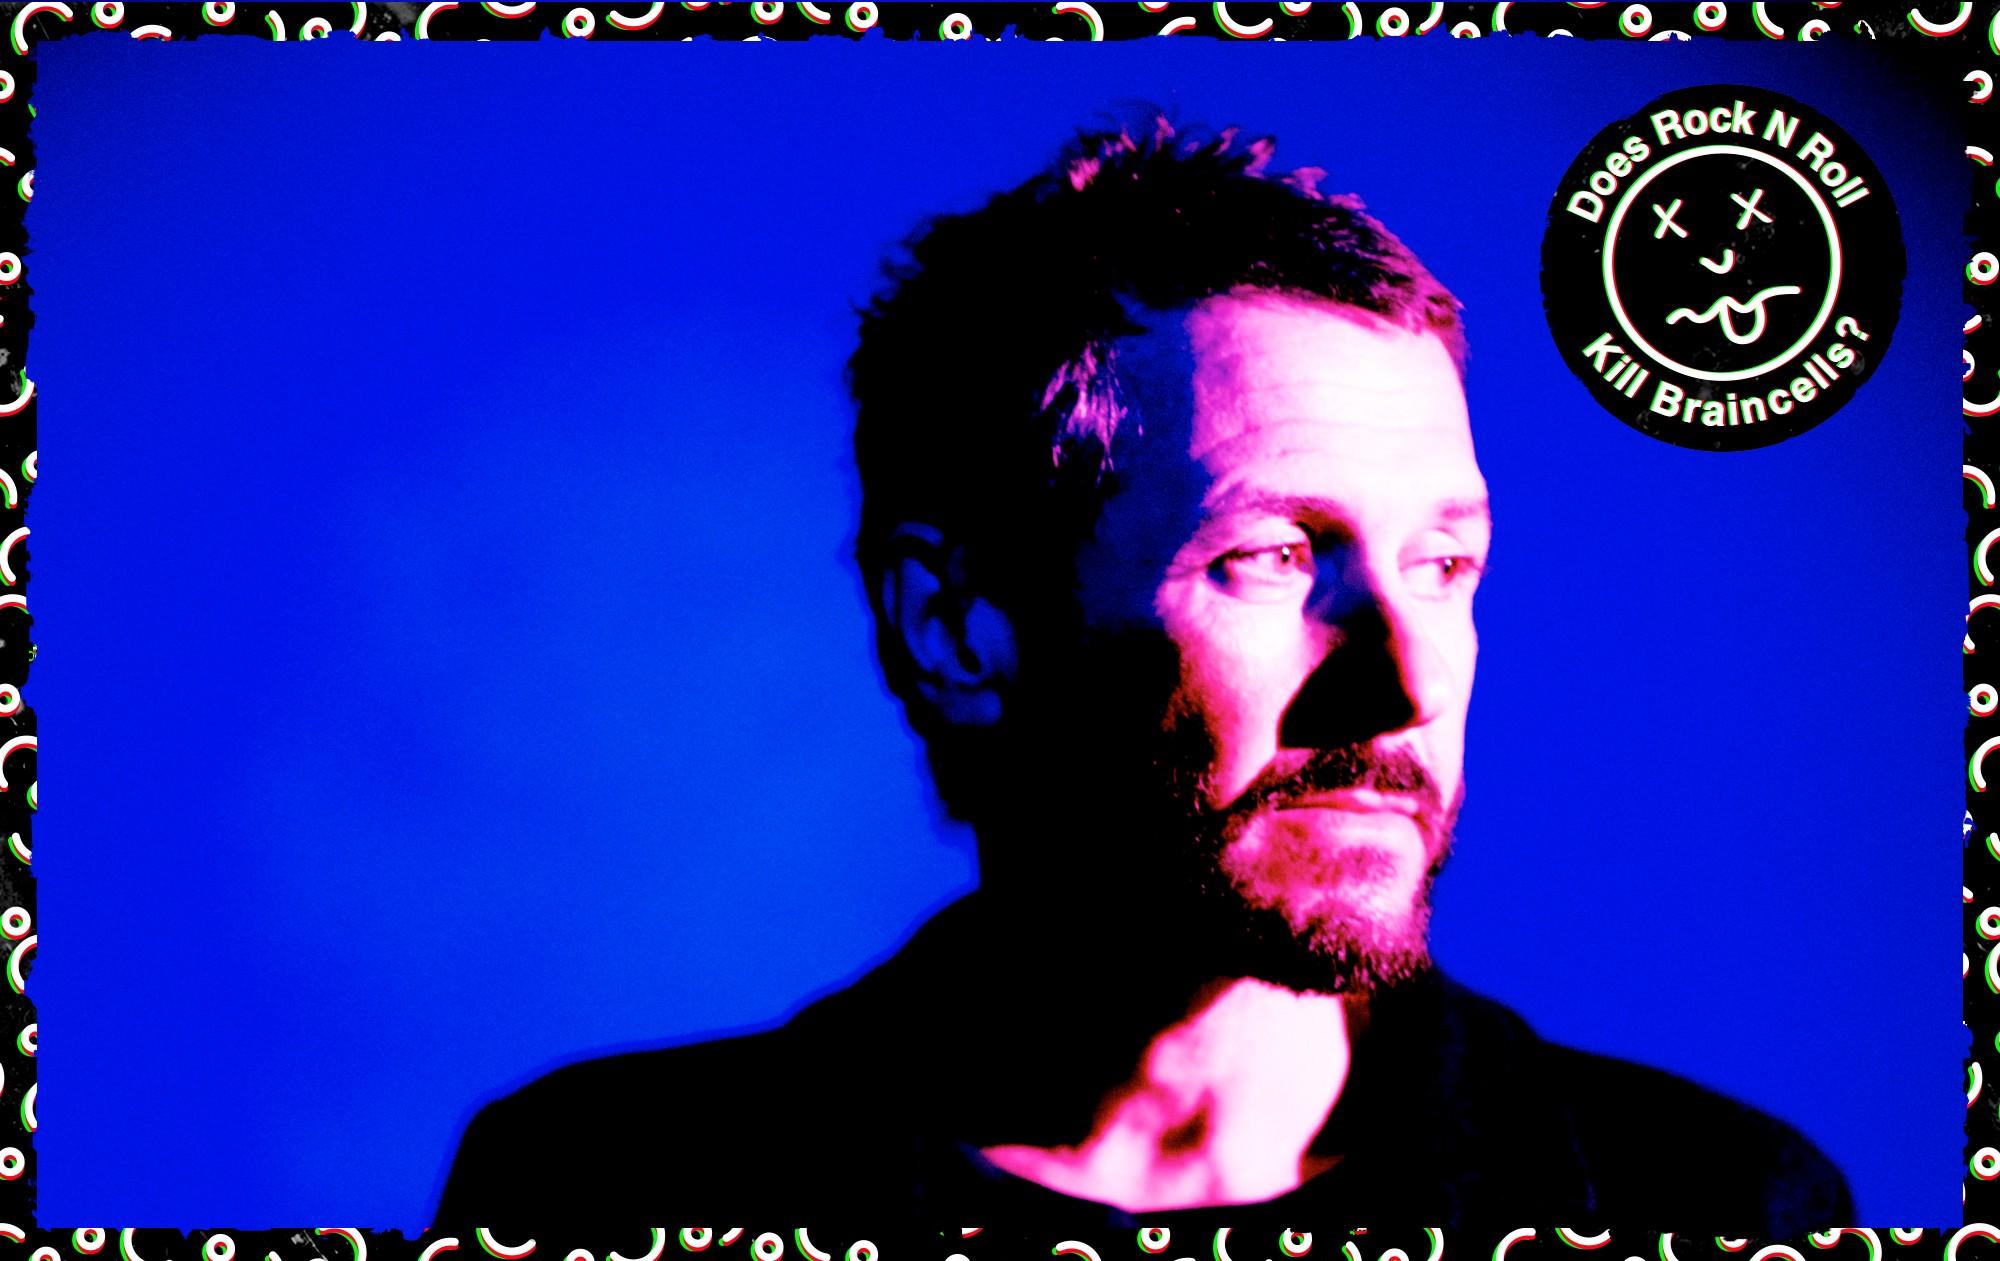 Does Rock 'N' Roll Kill Braincells?! – Grant Nicholas, Feeder NME interview